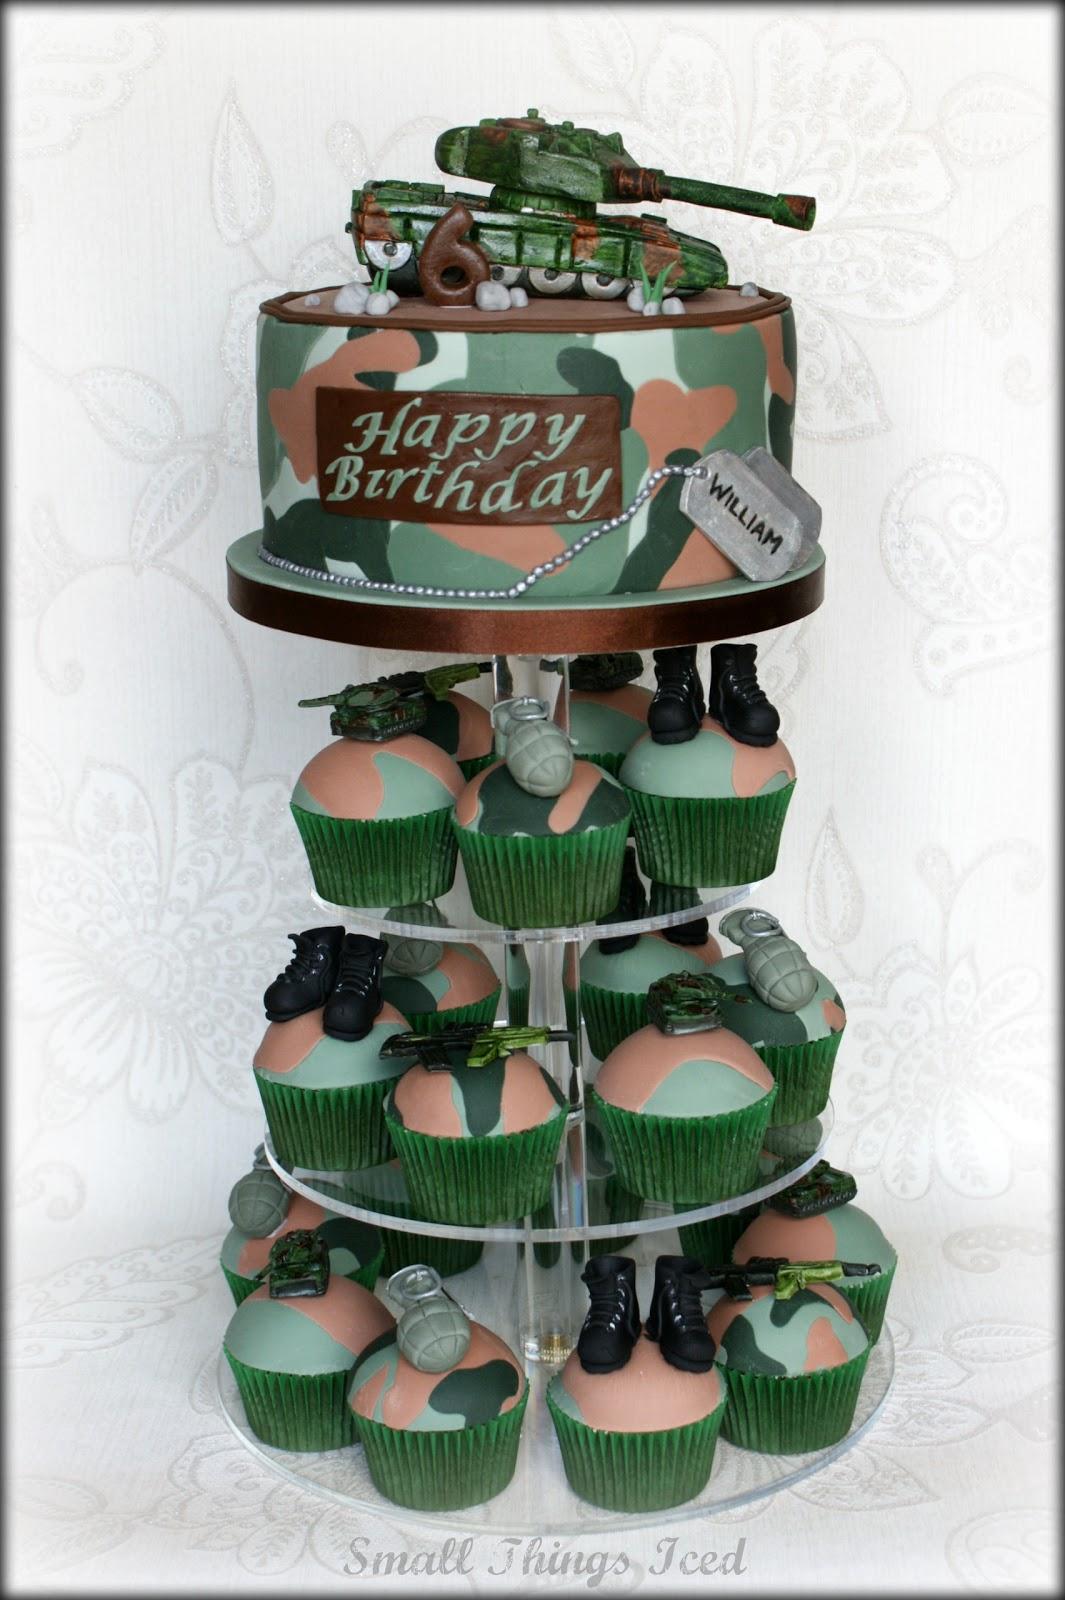 Miraculous 5 Army Themed Birthday Cakes Photo Army Theme Birthday Cake Funny Birthday Cards Online Alyptdamsfinfo